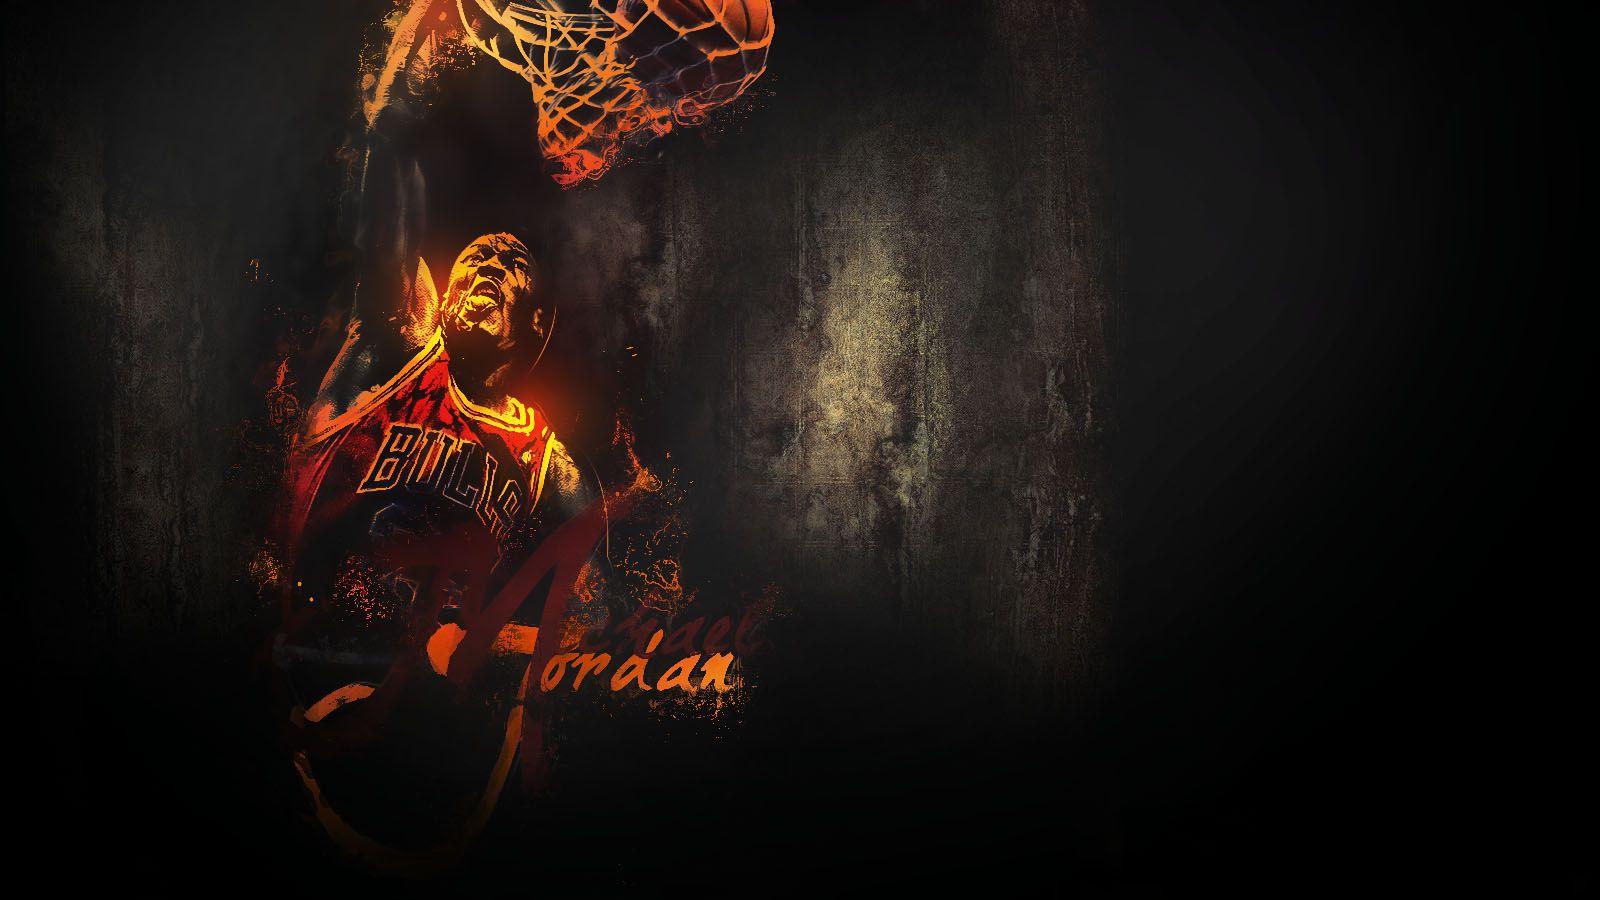 Michael Jordan HD Wallpapers Backgrounds Wallpaper 1920